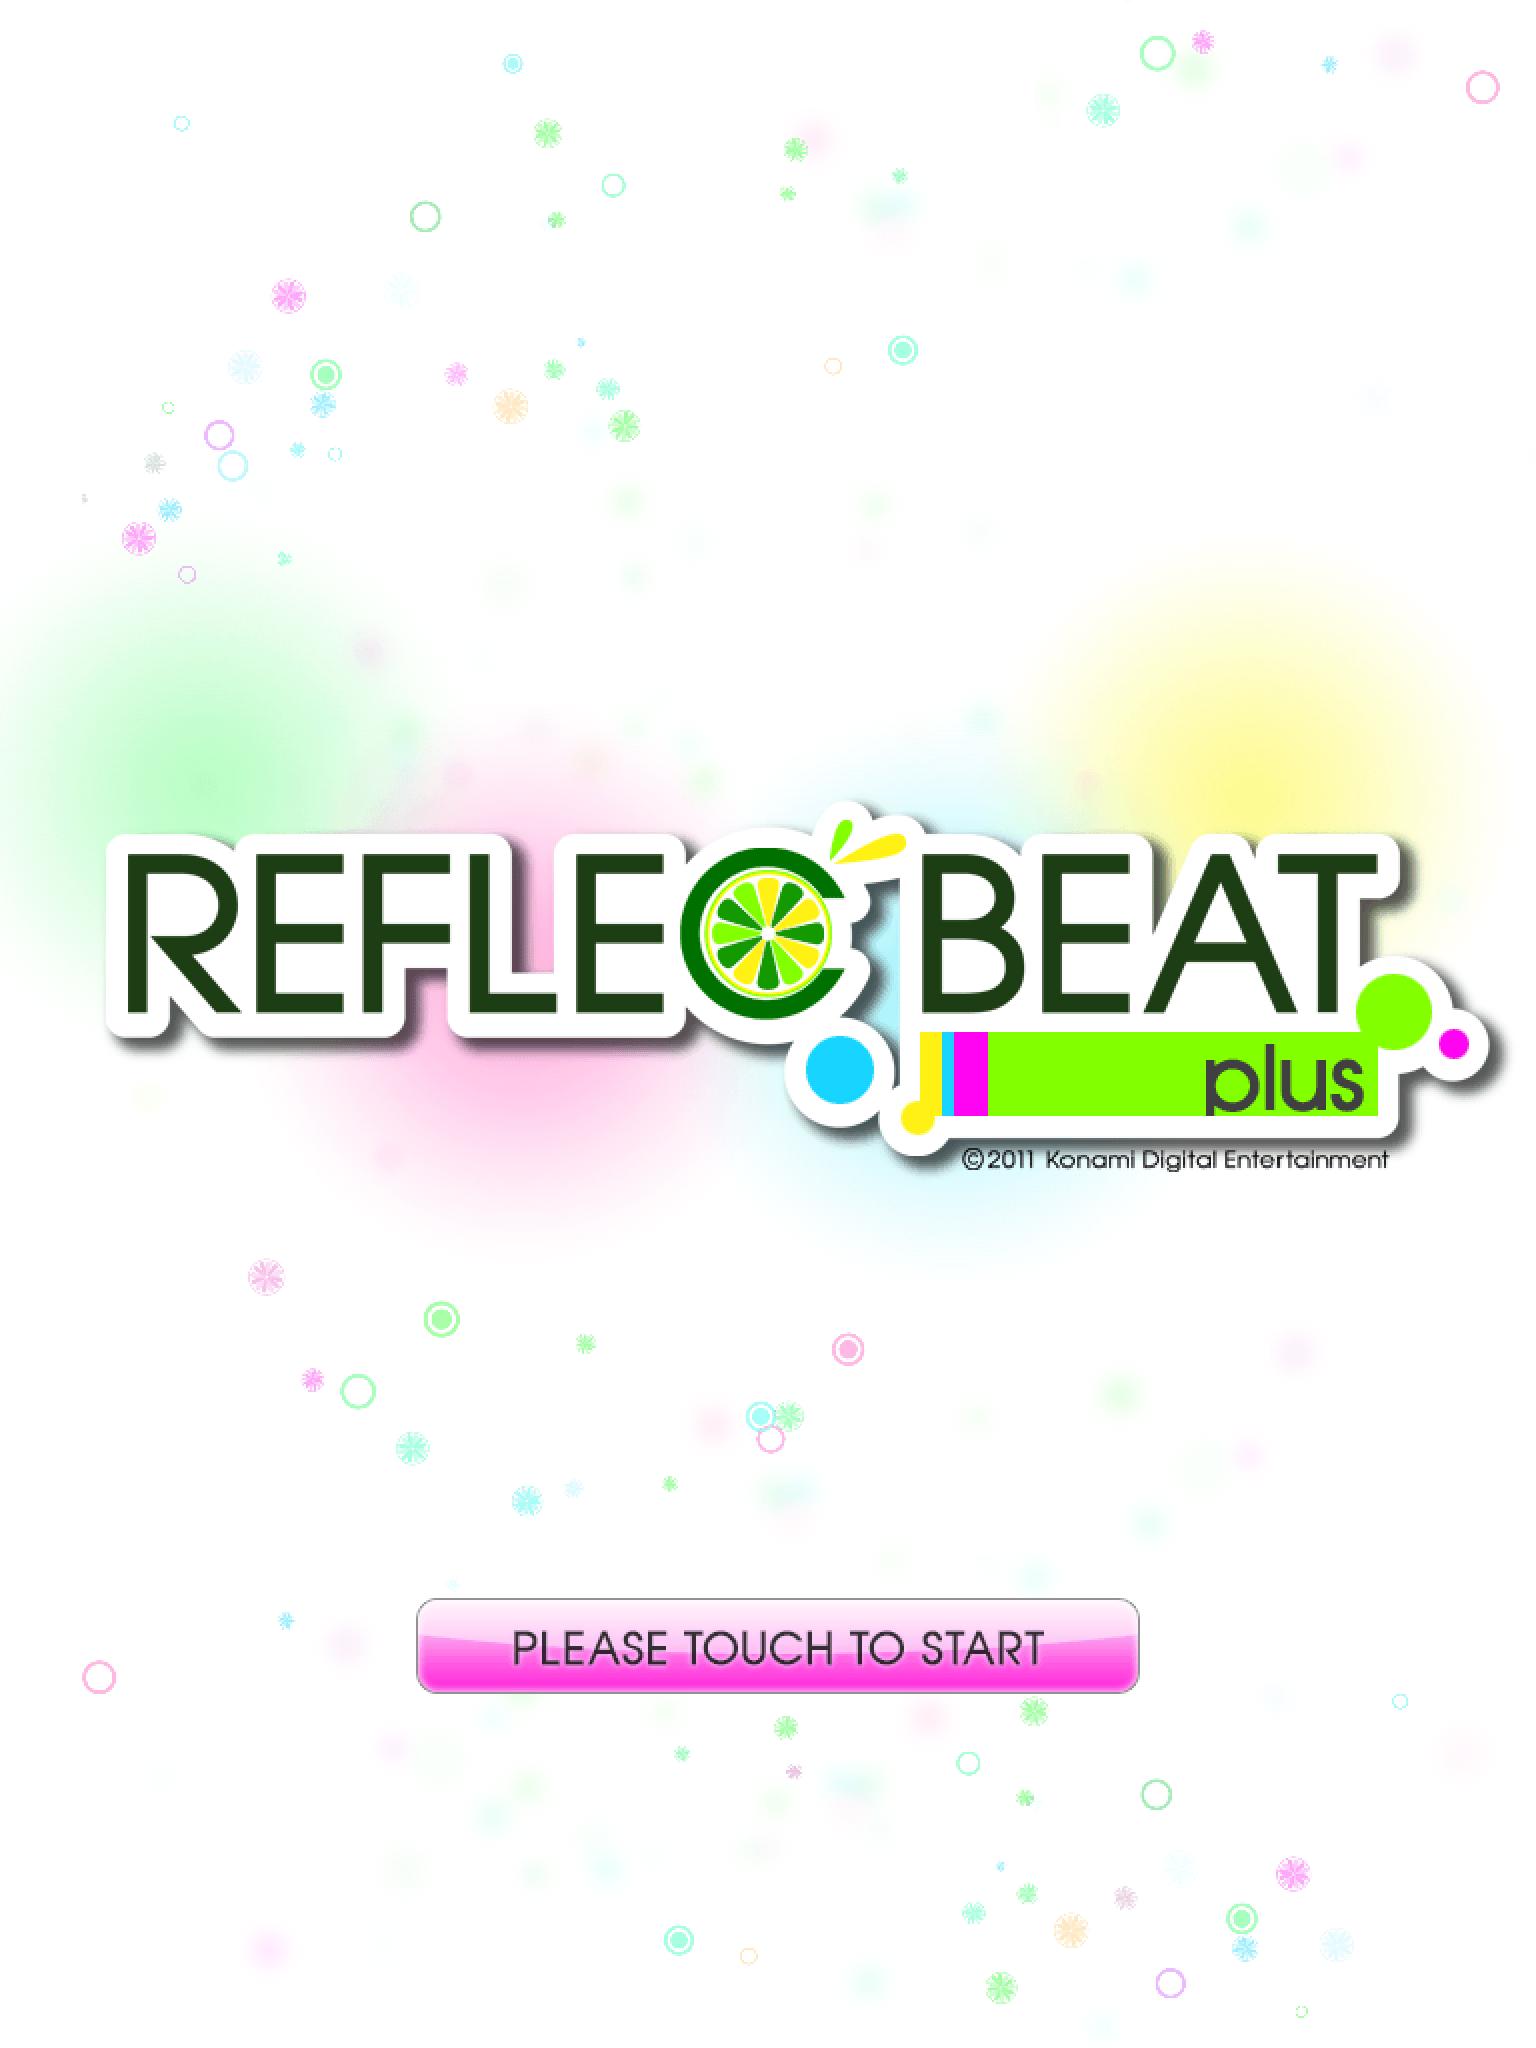 REFLECBEATplus